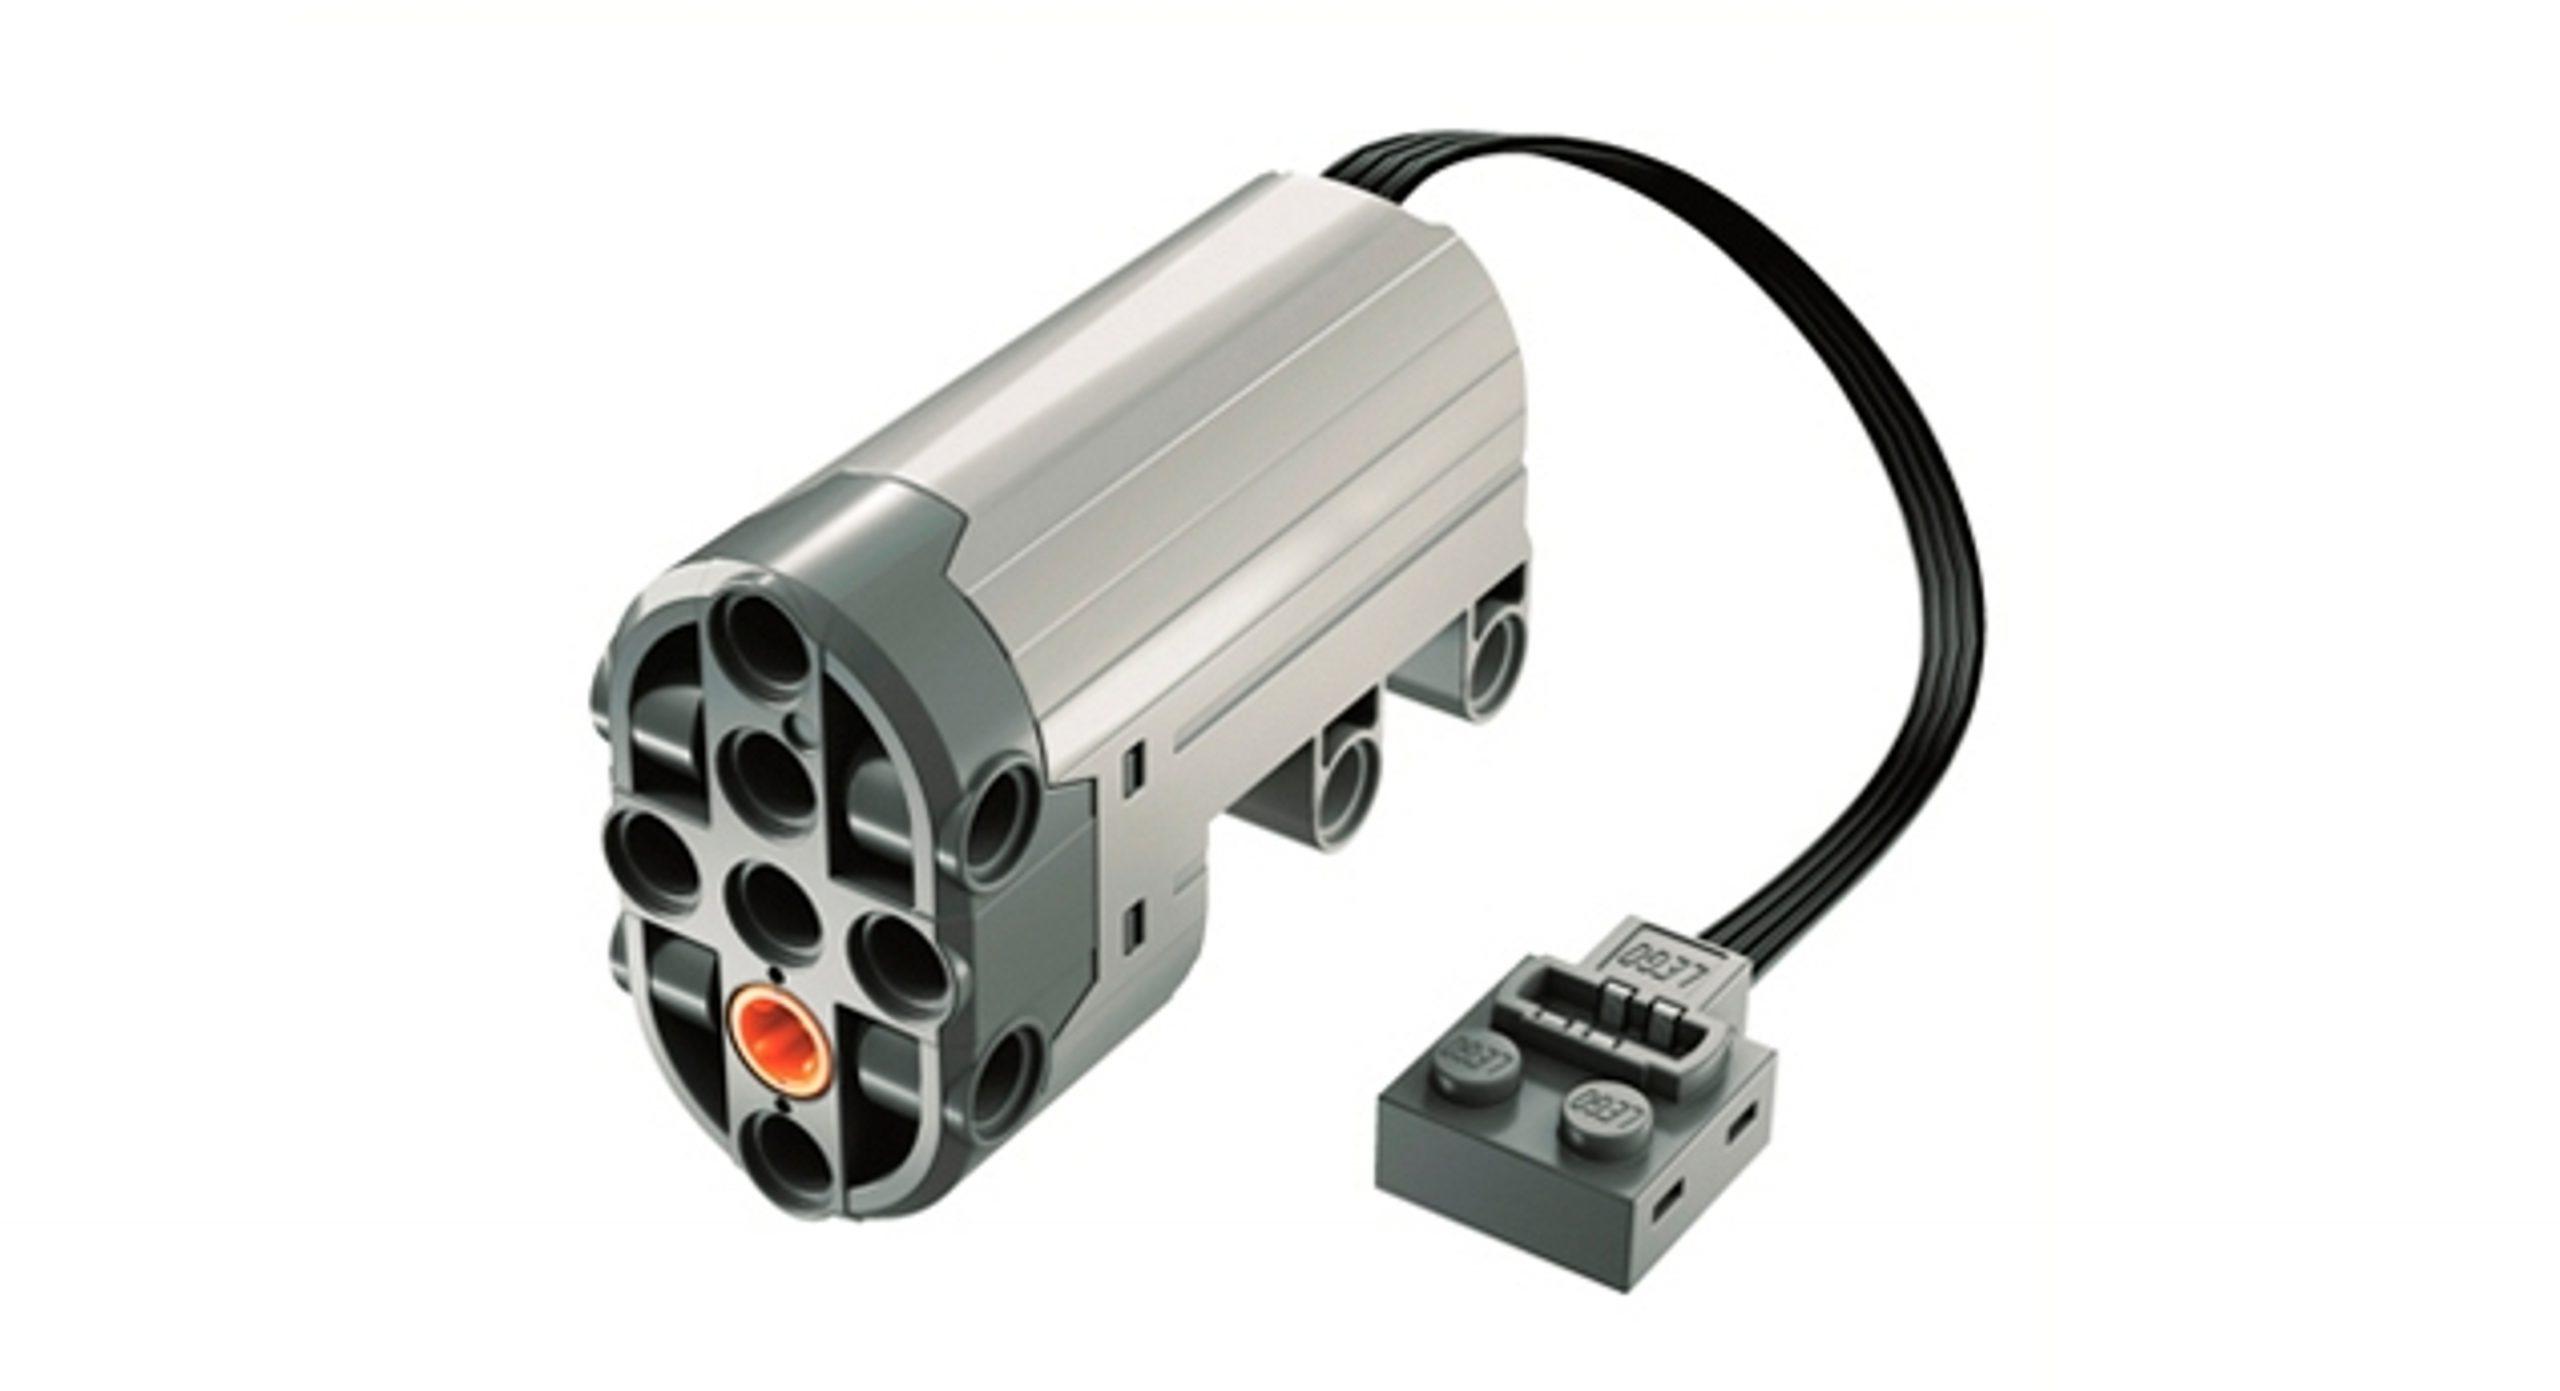 lego 88004 power functions servo motor scaled